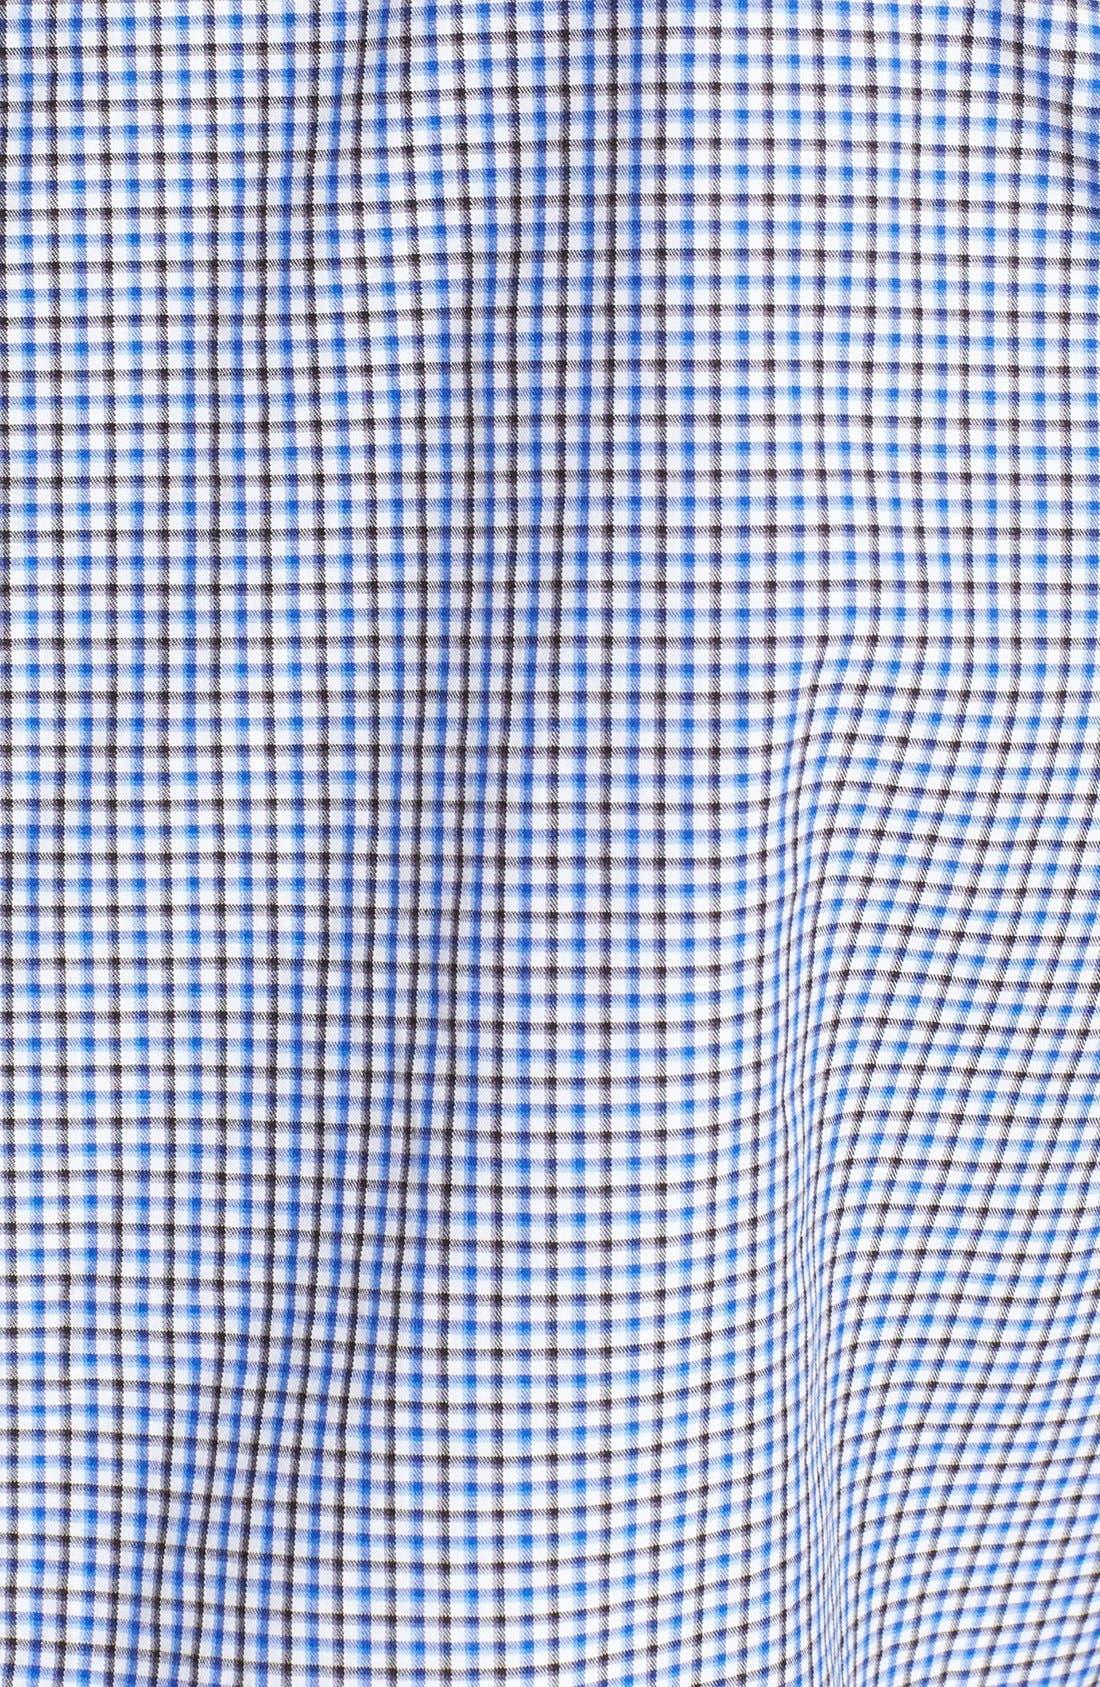 Alternate Image 3  - Junya Watanabe Check Cotton Shirt